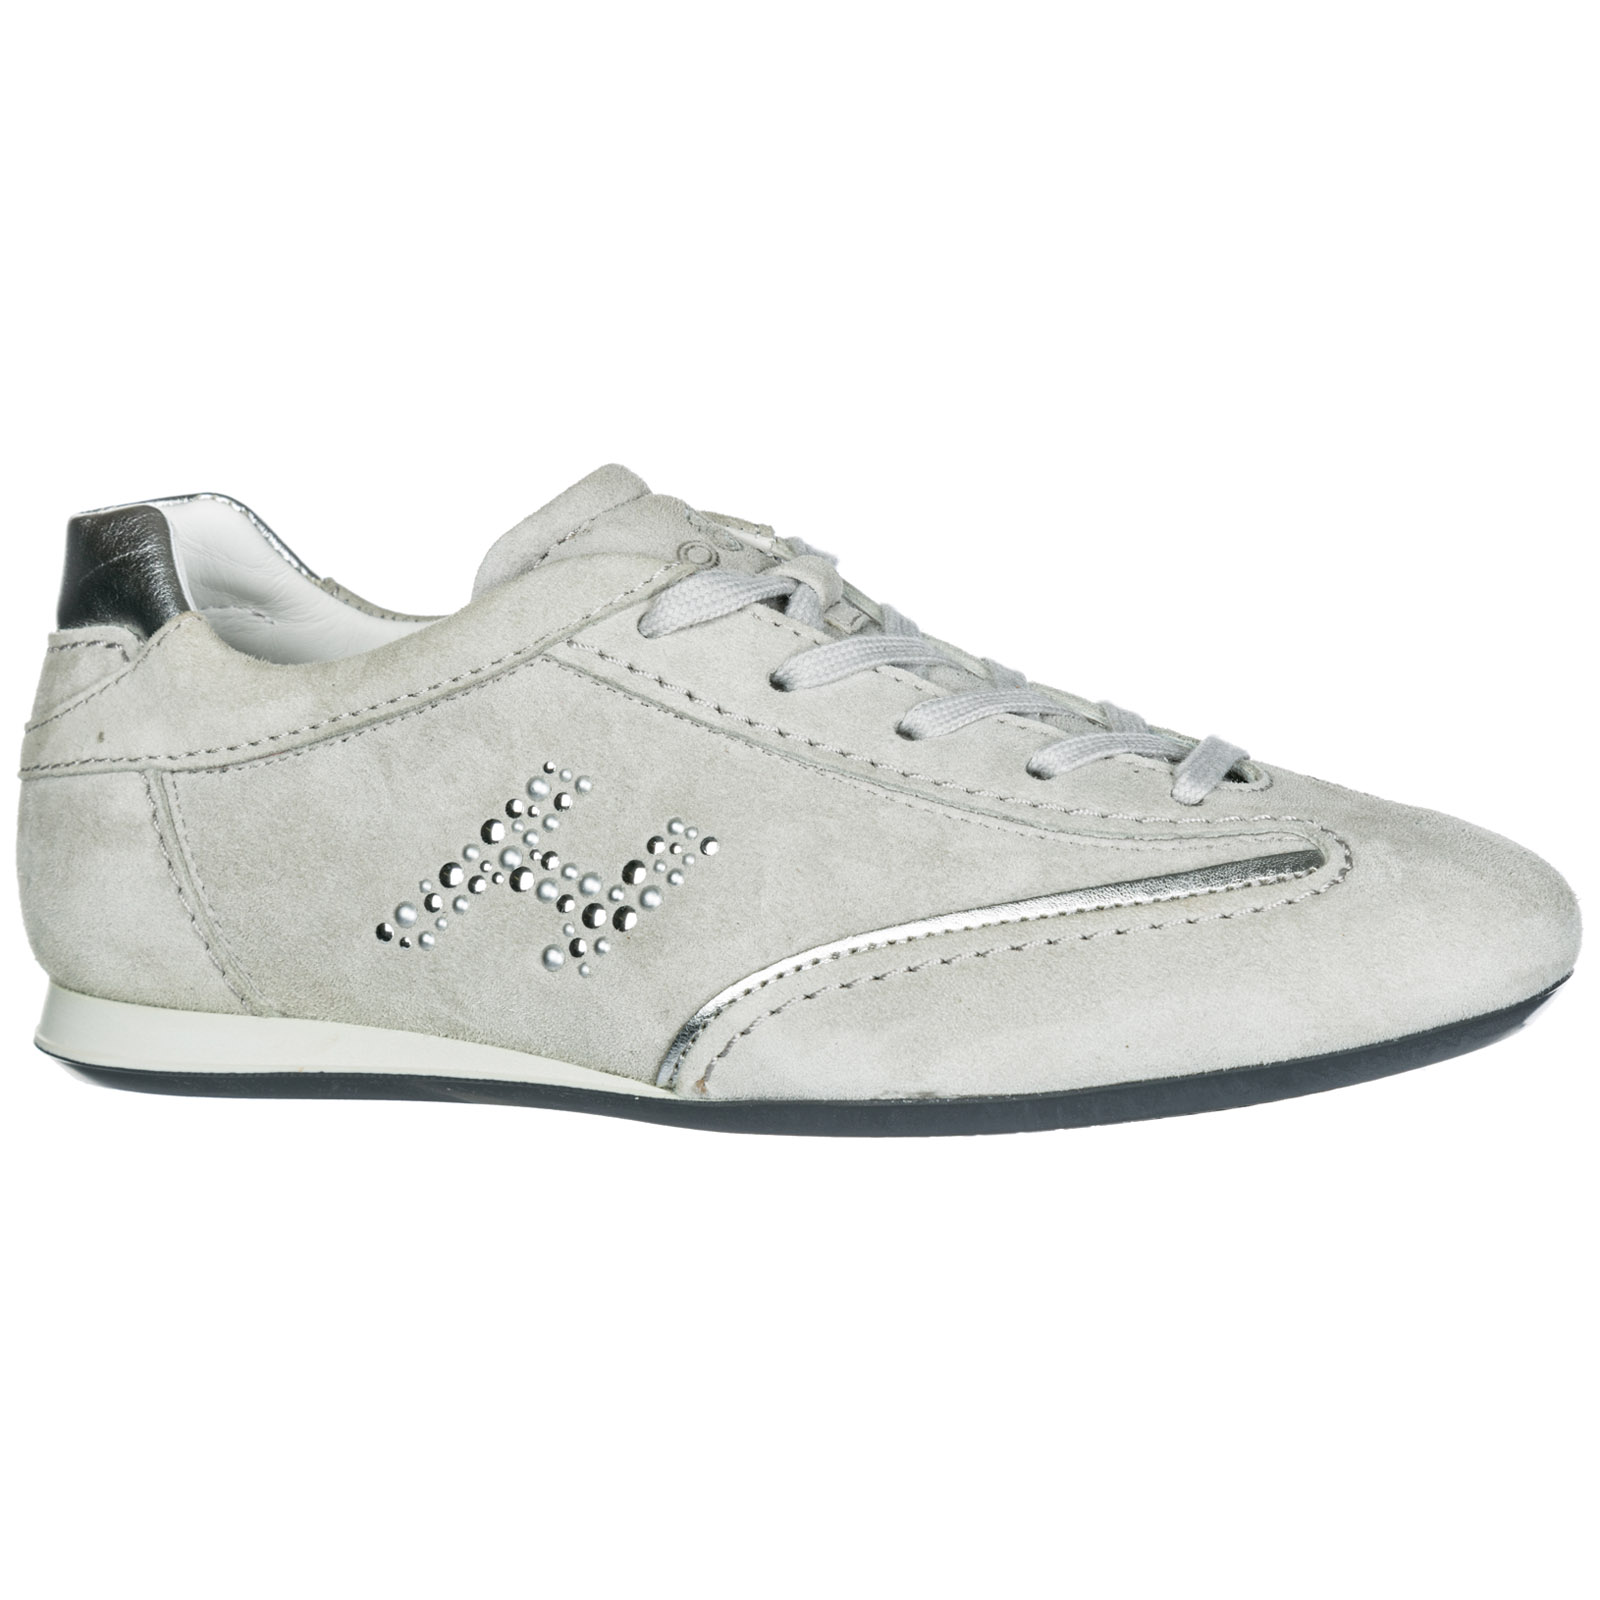 184696759db02 Sneakers Hogan Olympia HXW0520Q060Q25109A argento nebbia